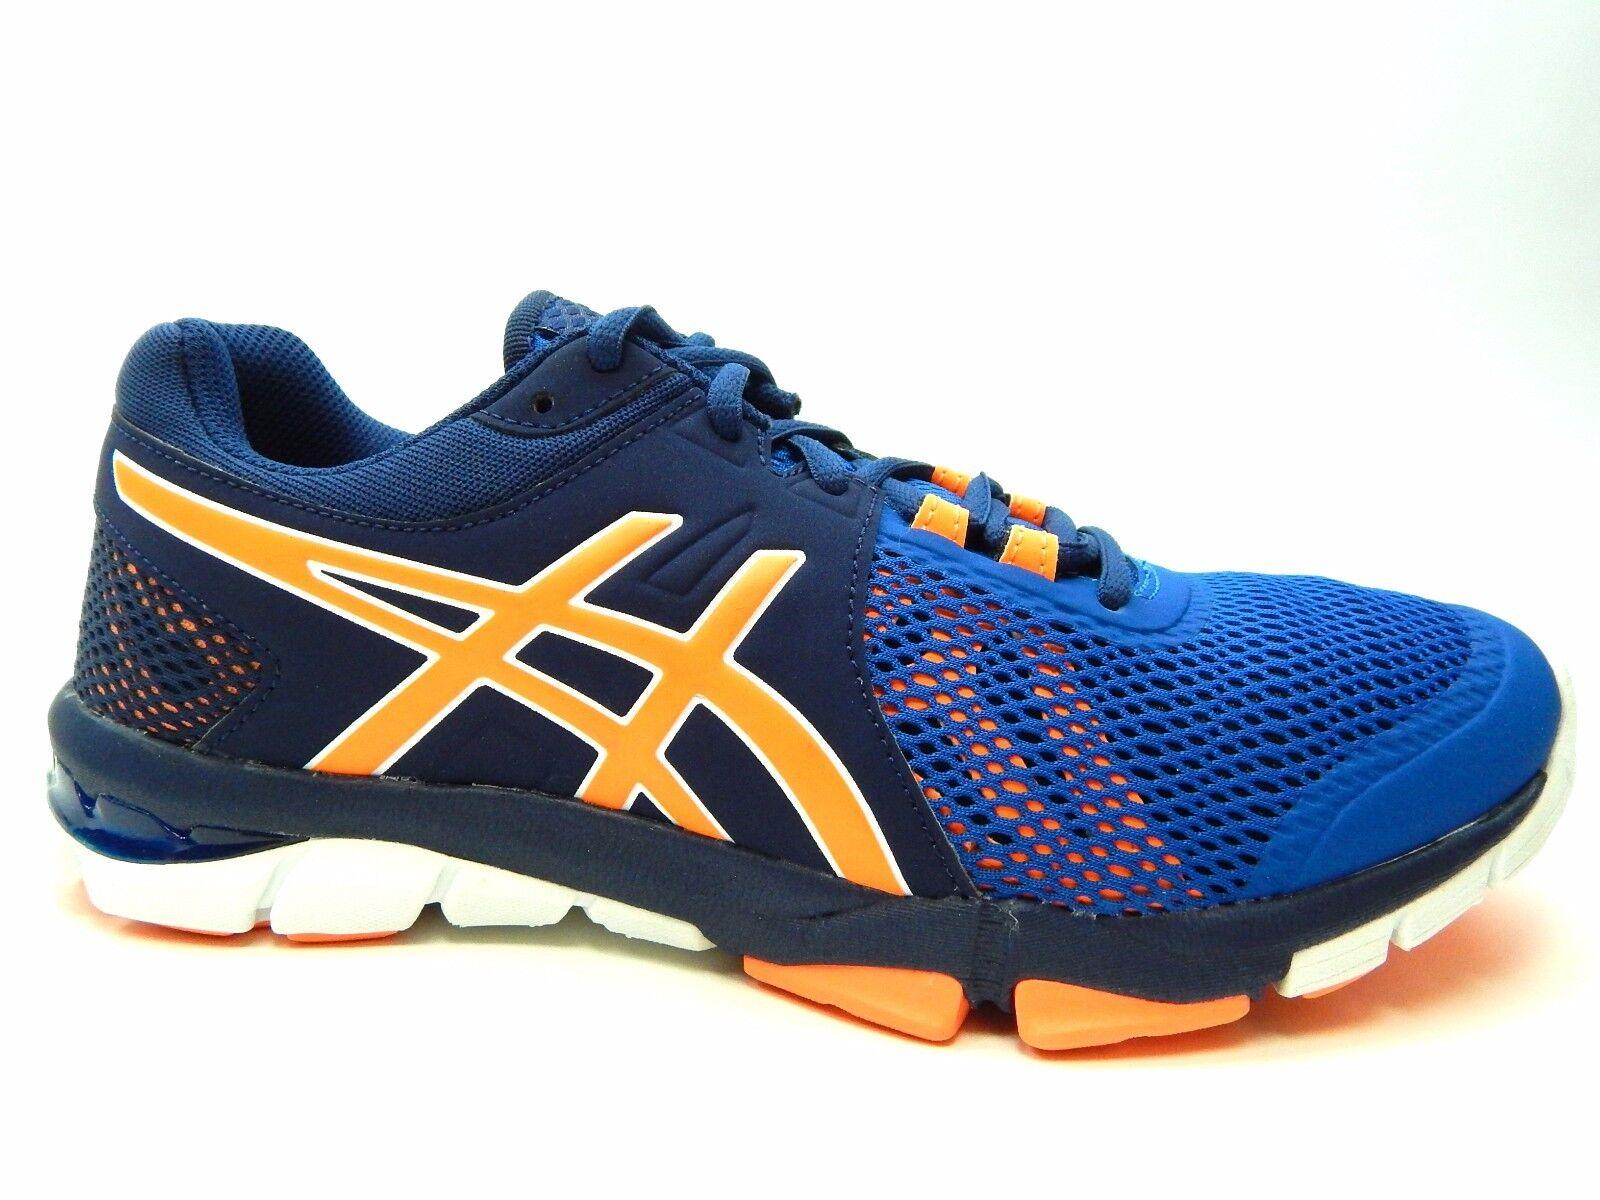 ASICS gel craze Tr 4 Indigo naranja s705n 4930 talla de zapatos masculinos 7,0